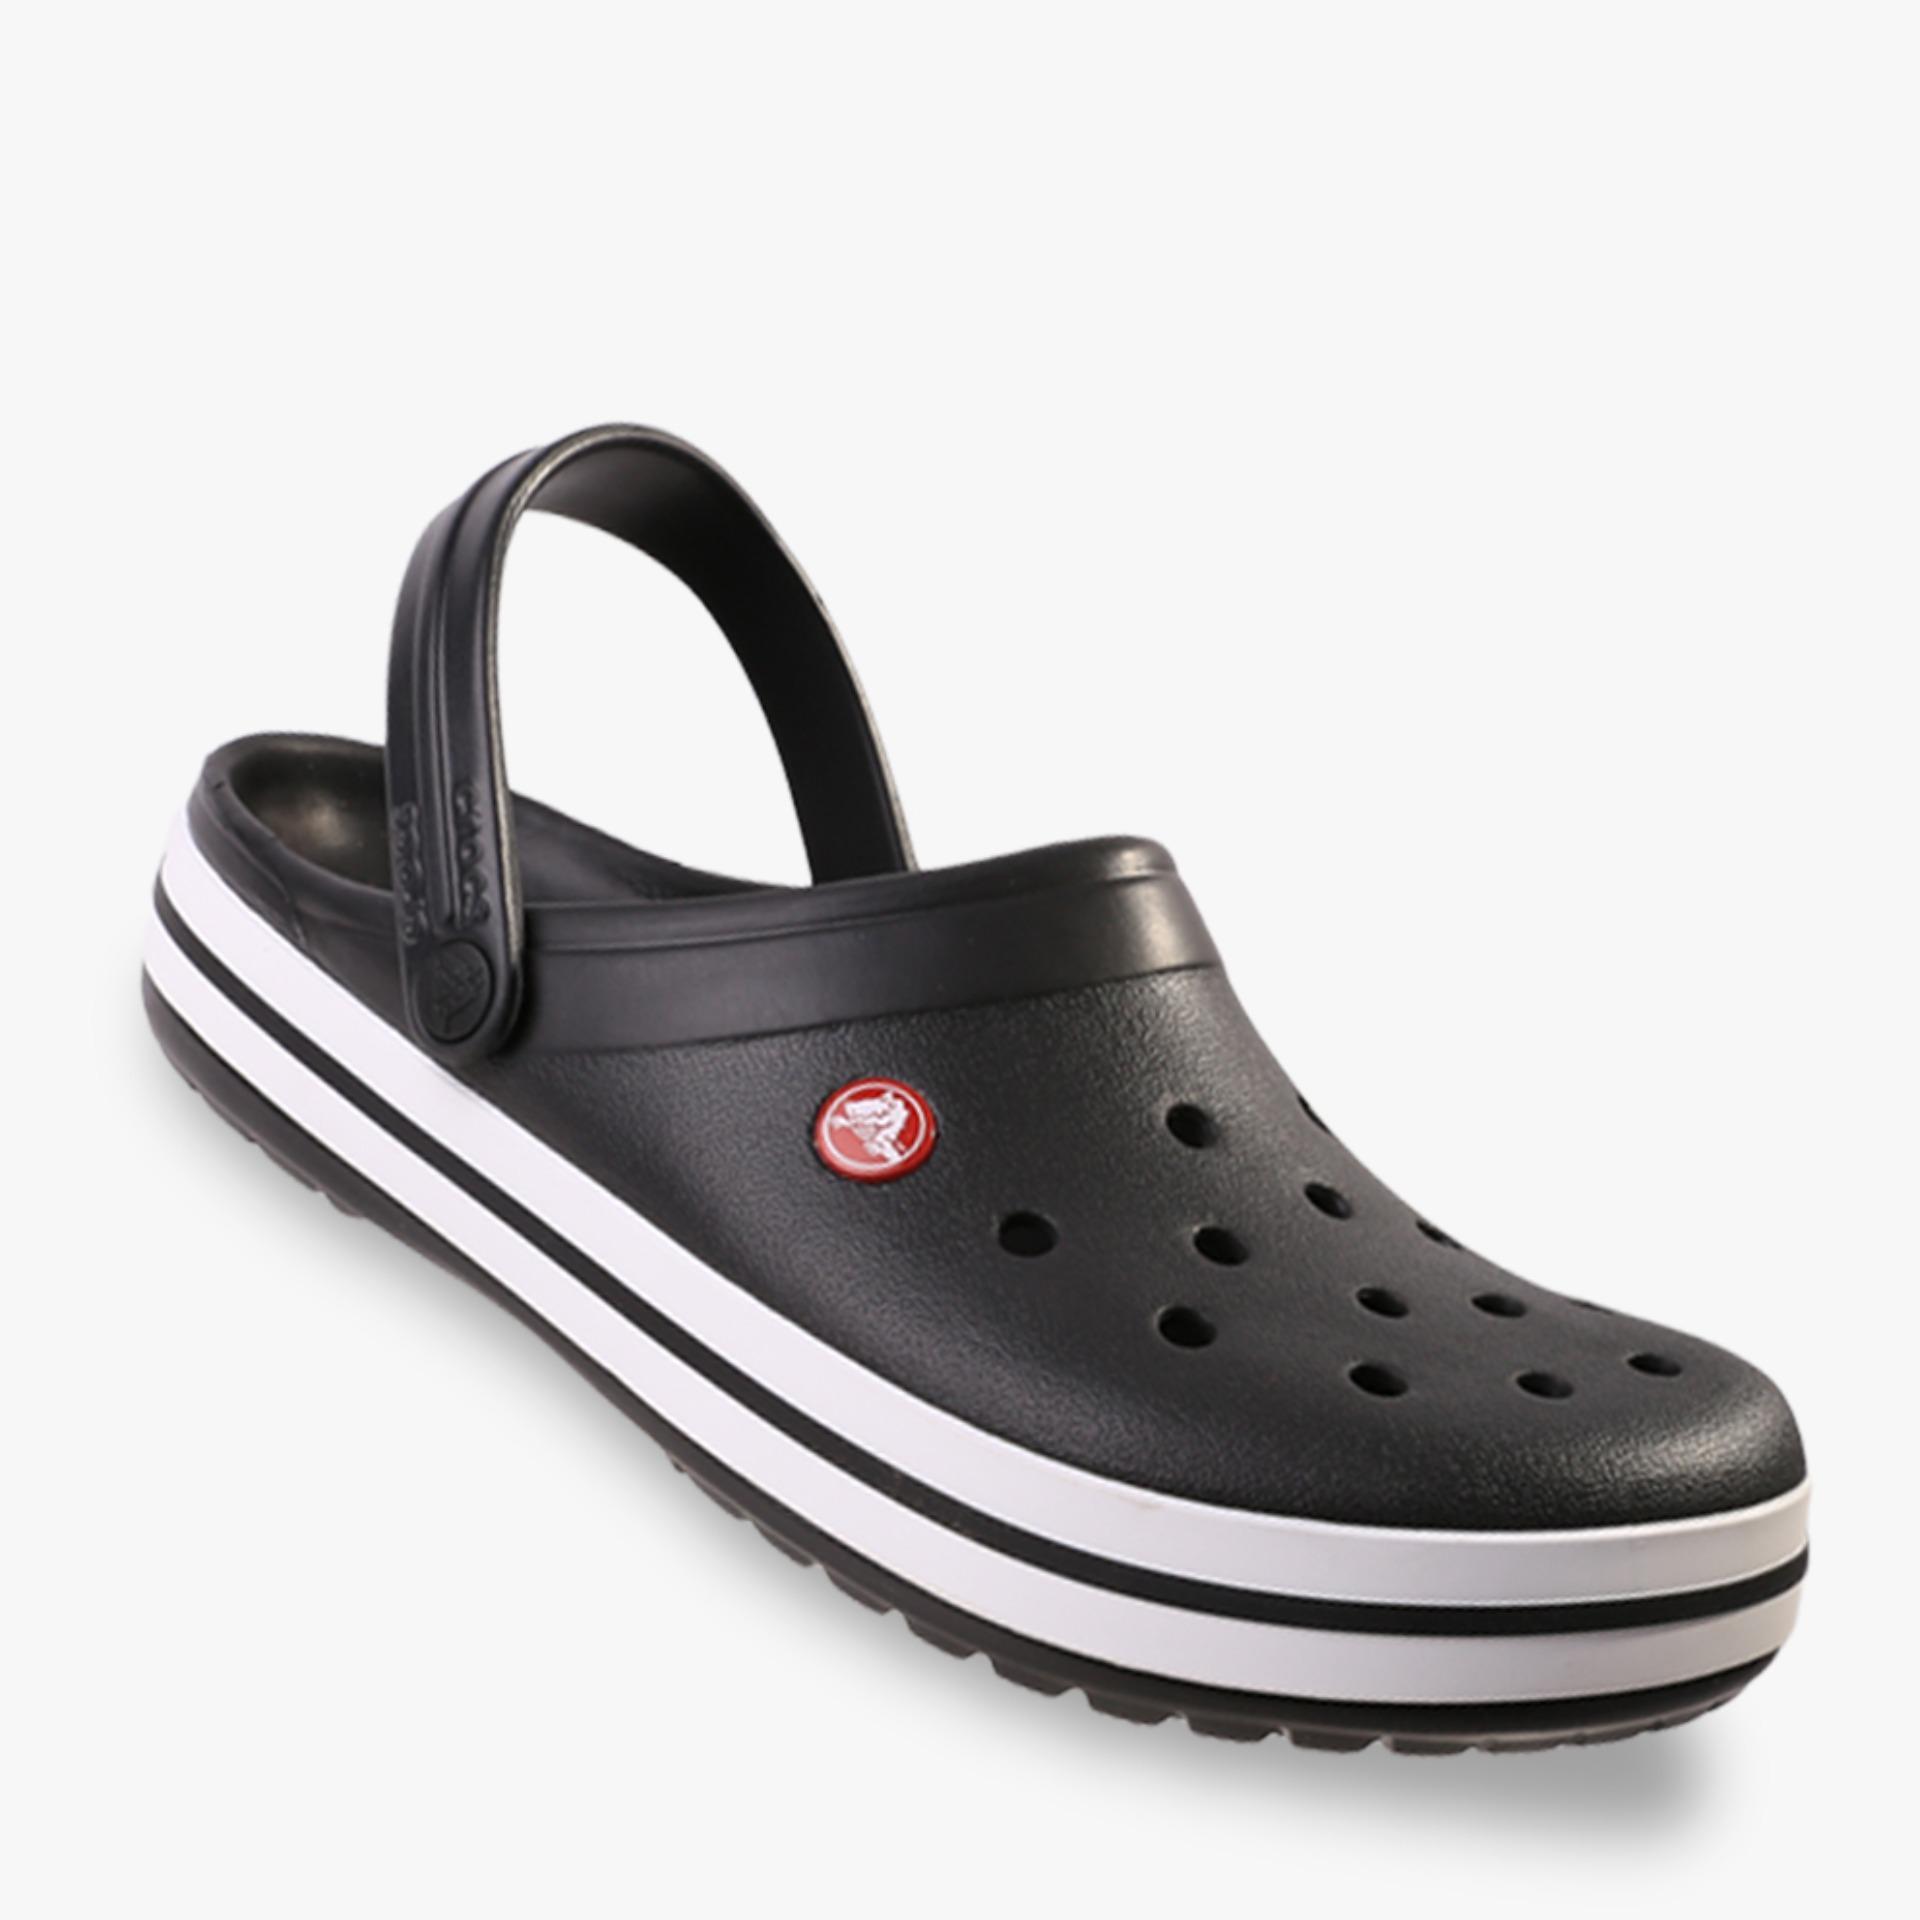 Crocs Crocband Clog Unisex Sandals - Hitam